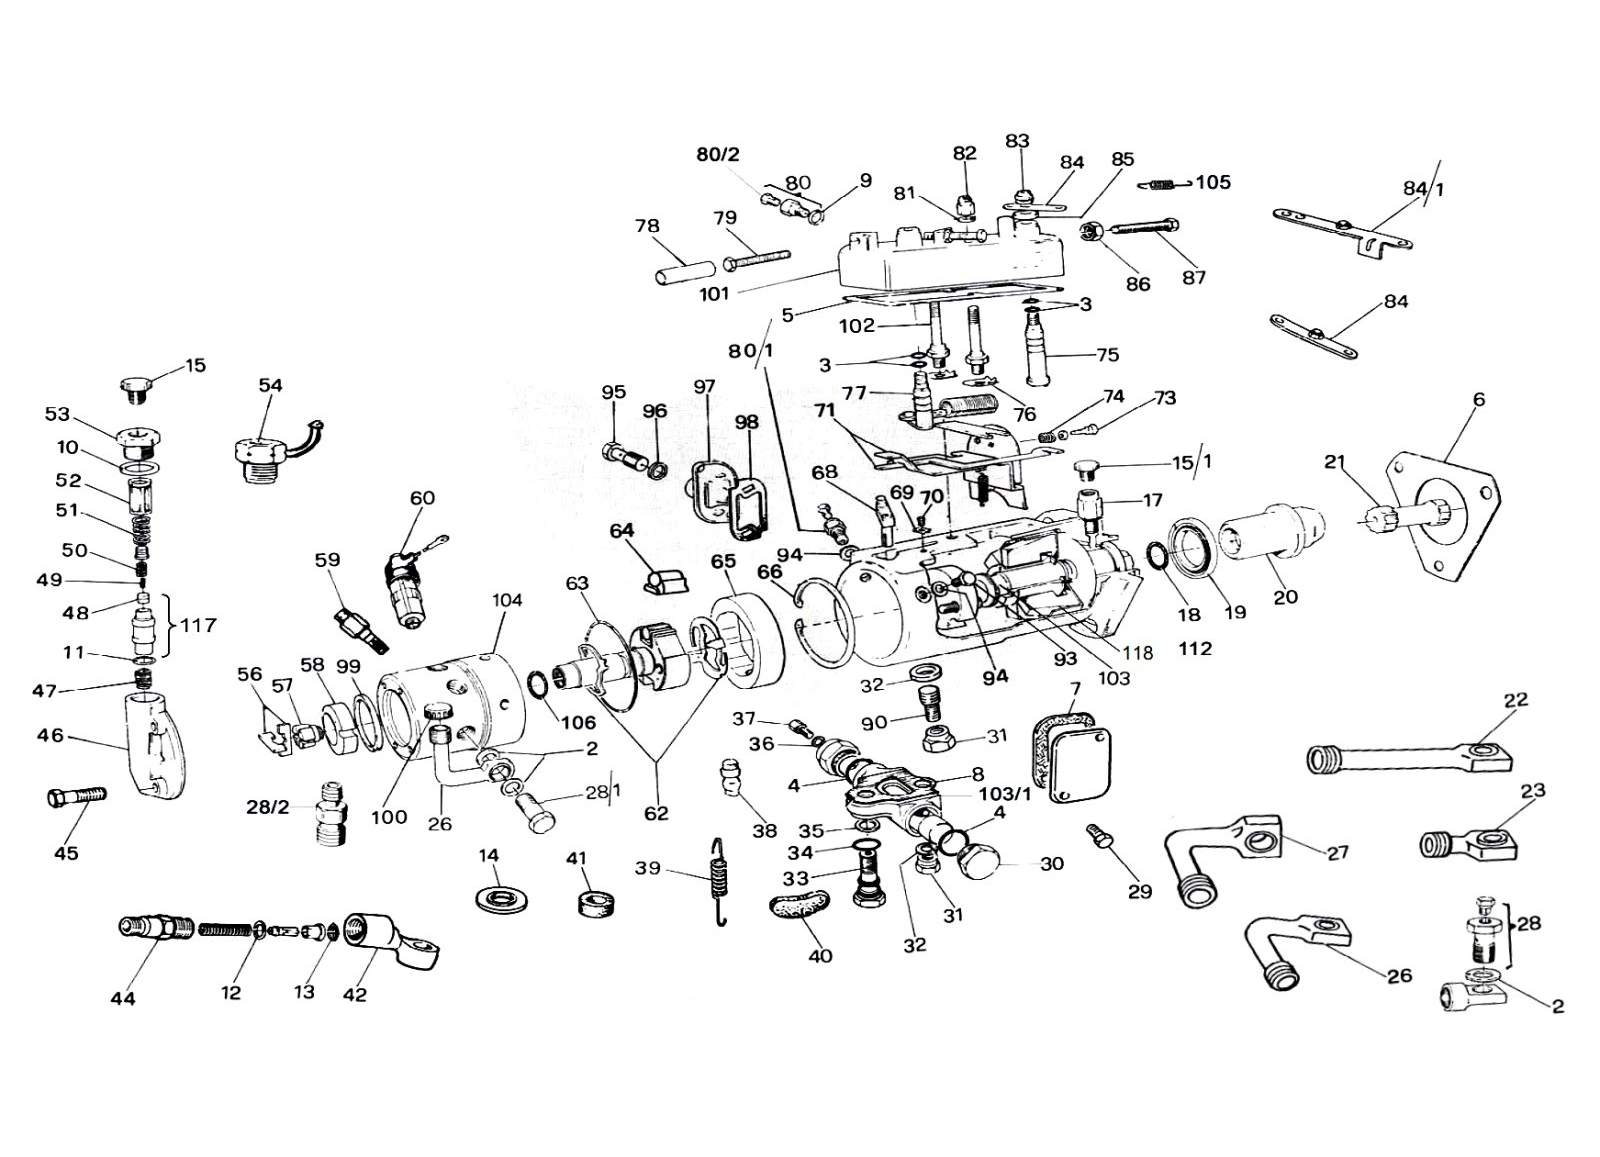 Lucas CAV DPA Fuel Injection Pump Exploded Parts Diagram